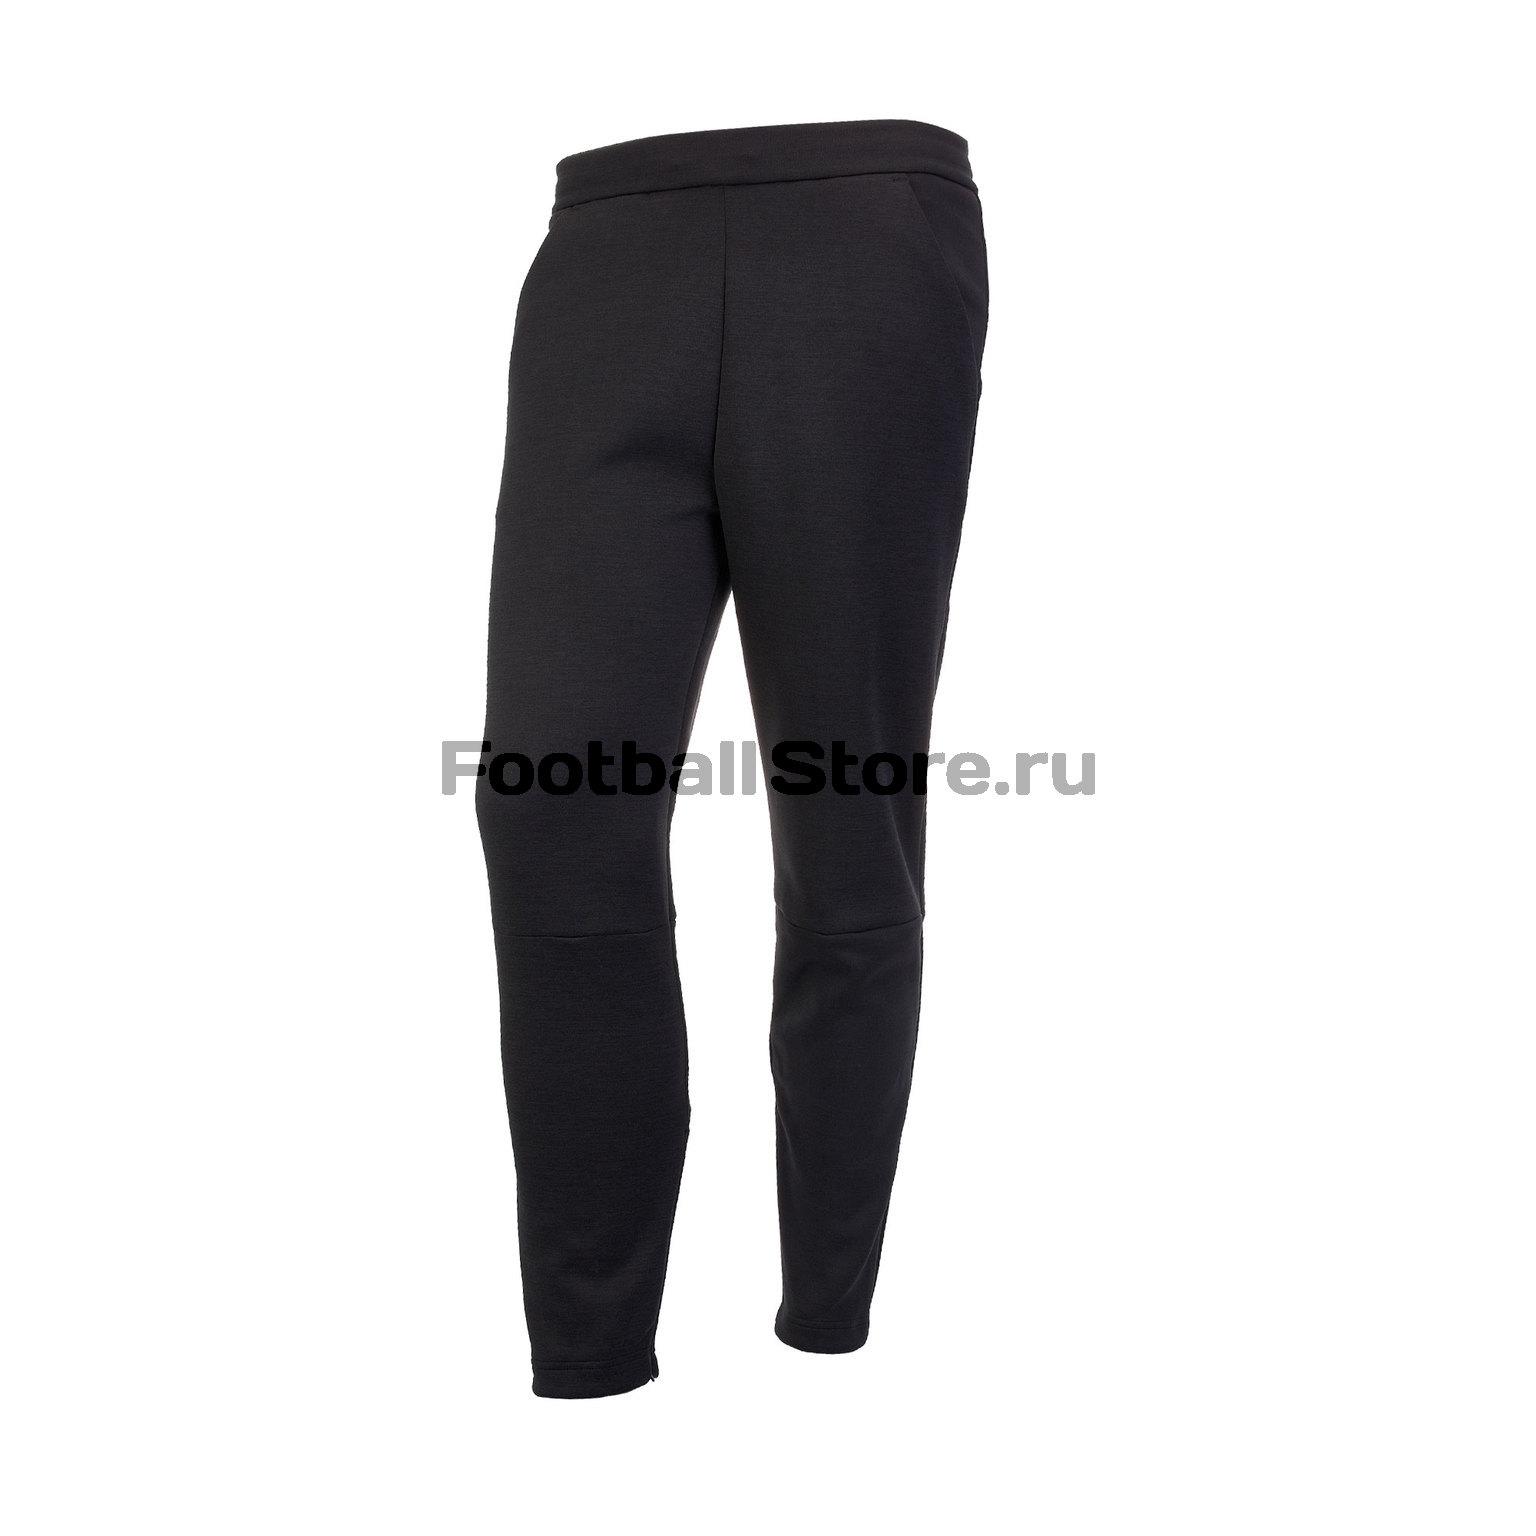 Брюки Adidas ZNE D74654 рюкзак adidas zne bp core gr цвет черный dt5086